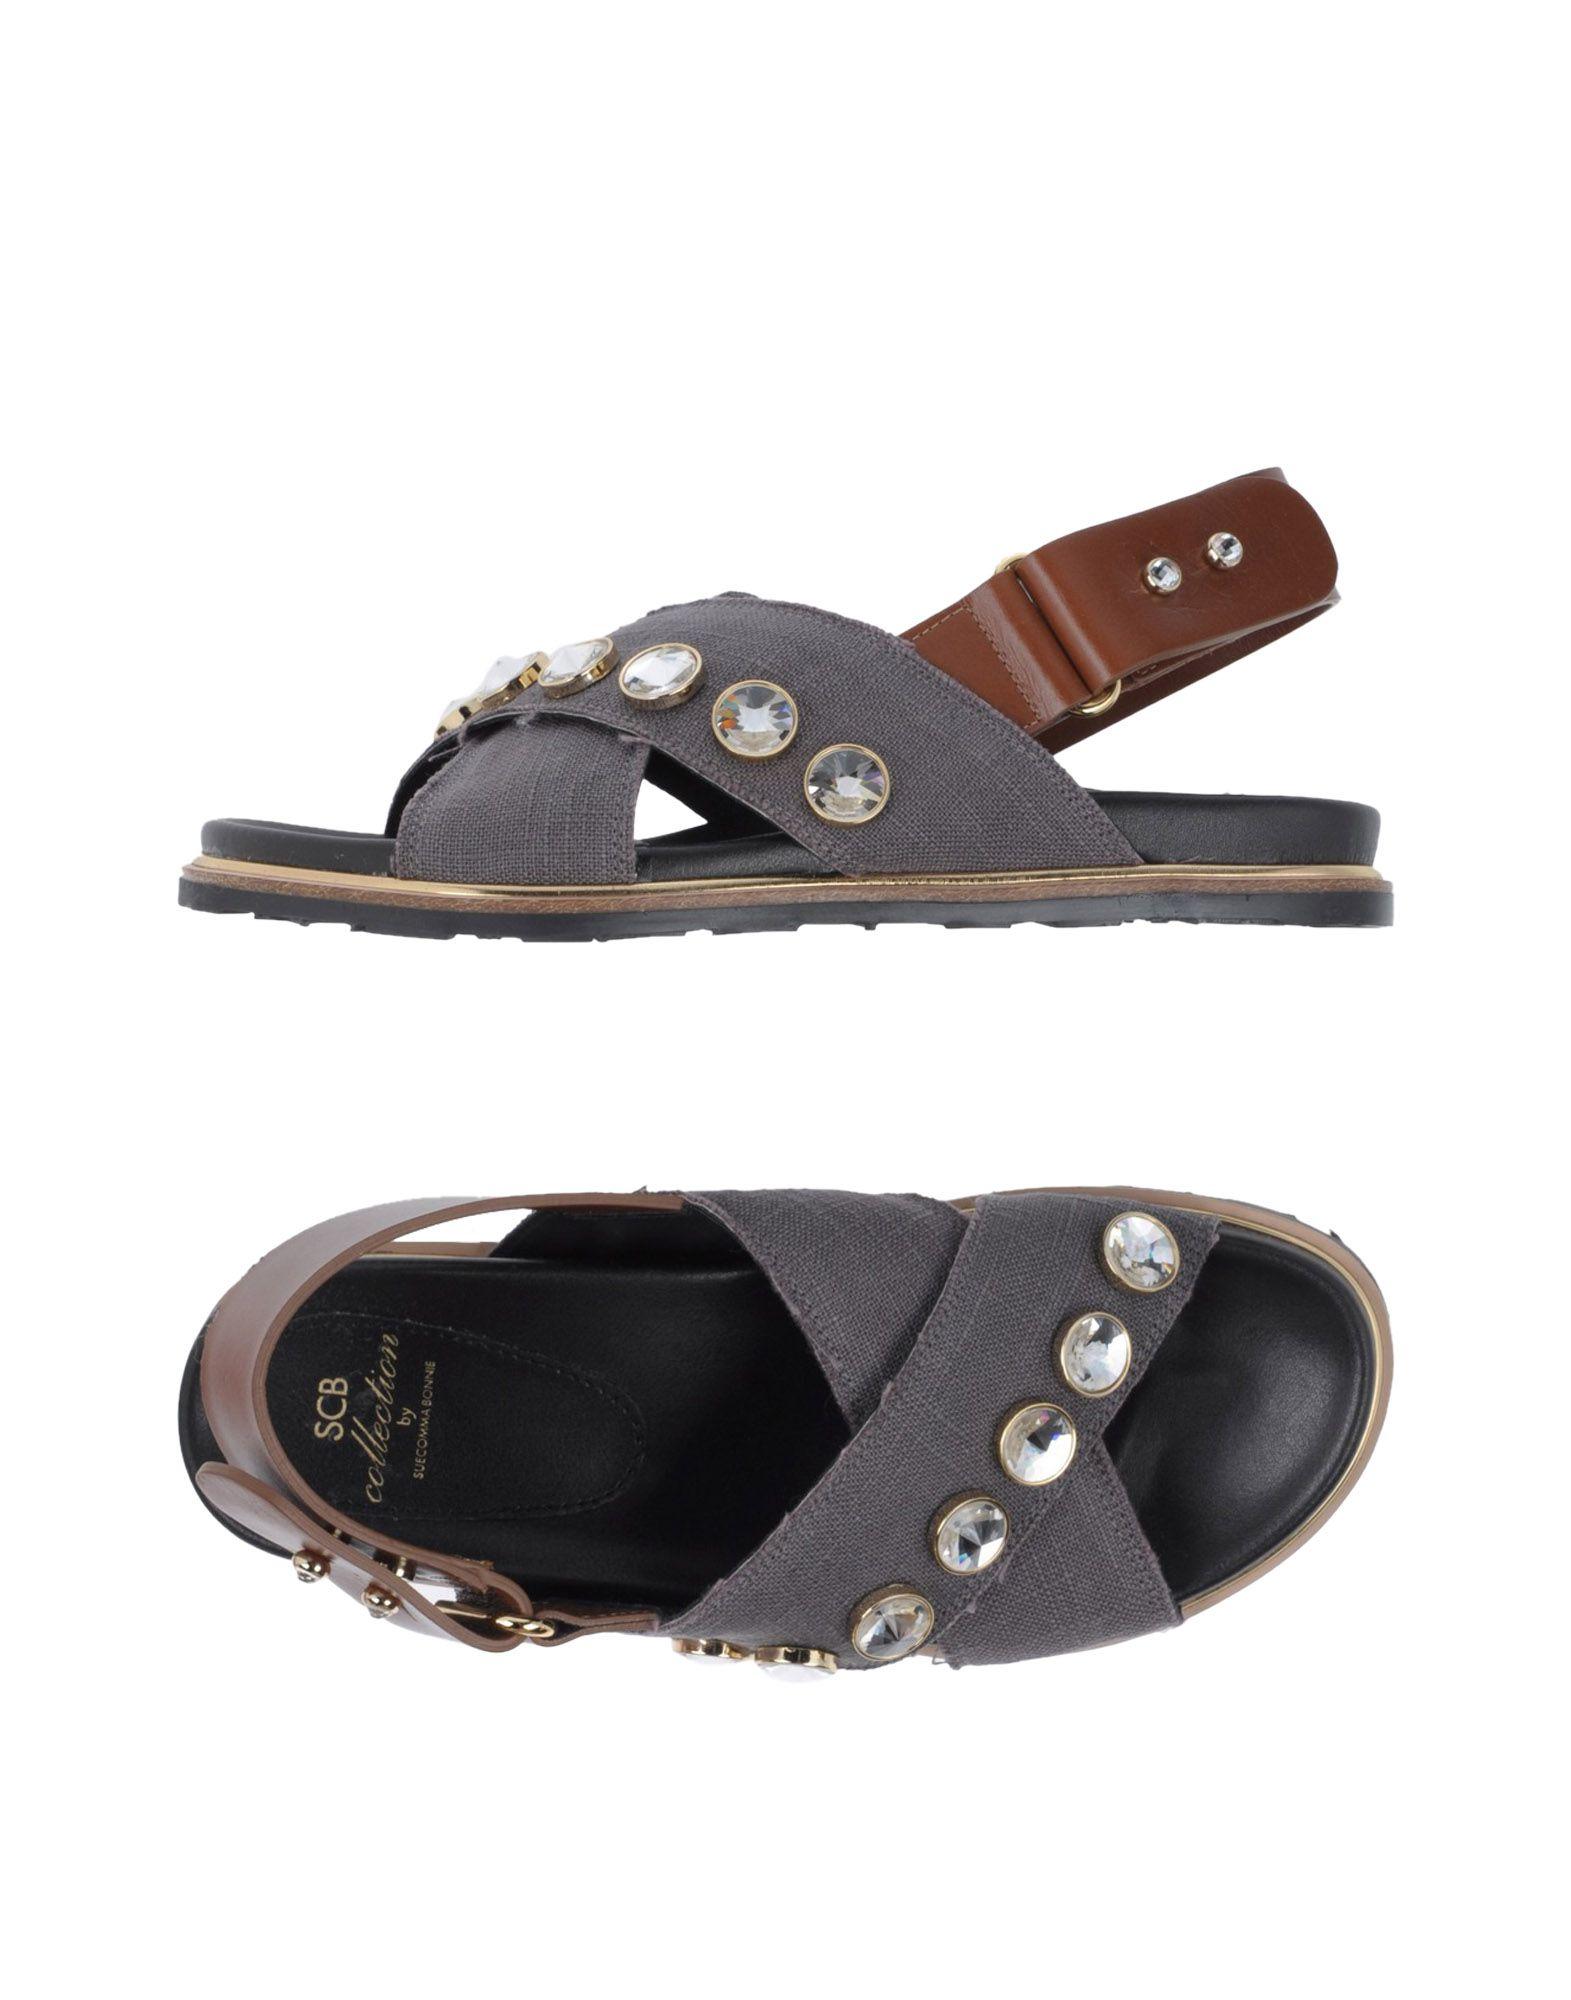 Suecomma Bonnie Sandalen Damen  11386641QB Gute Qualität beliebte Schuhe